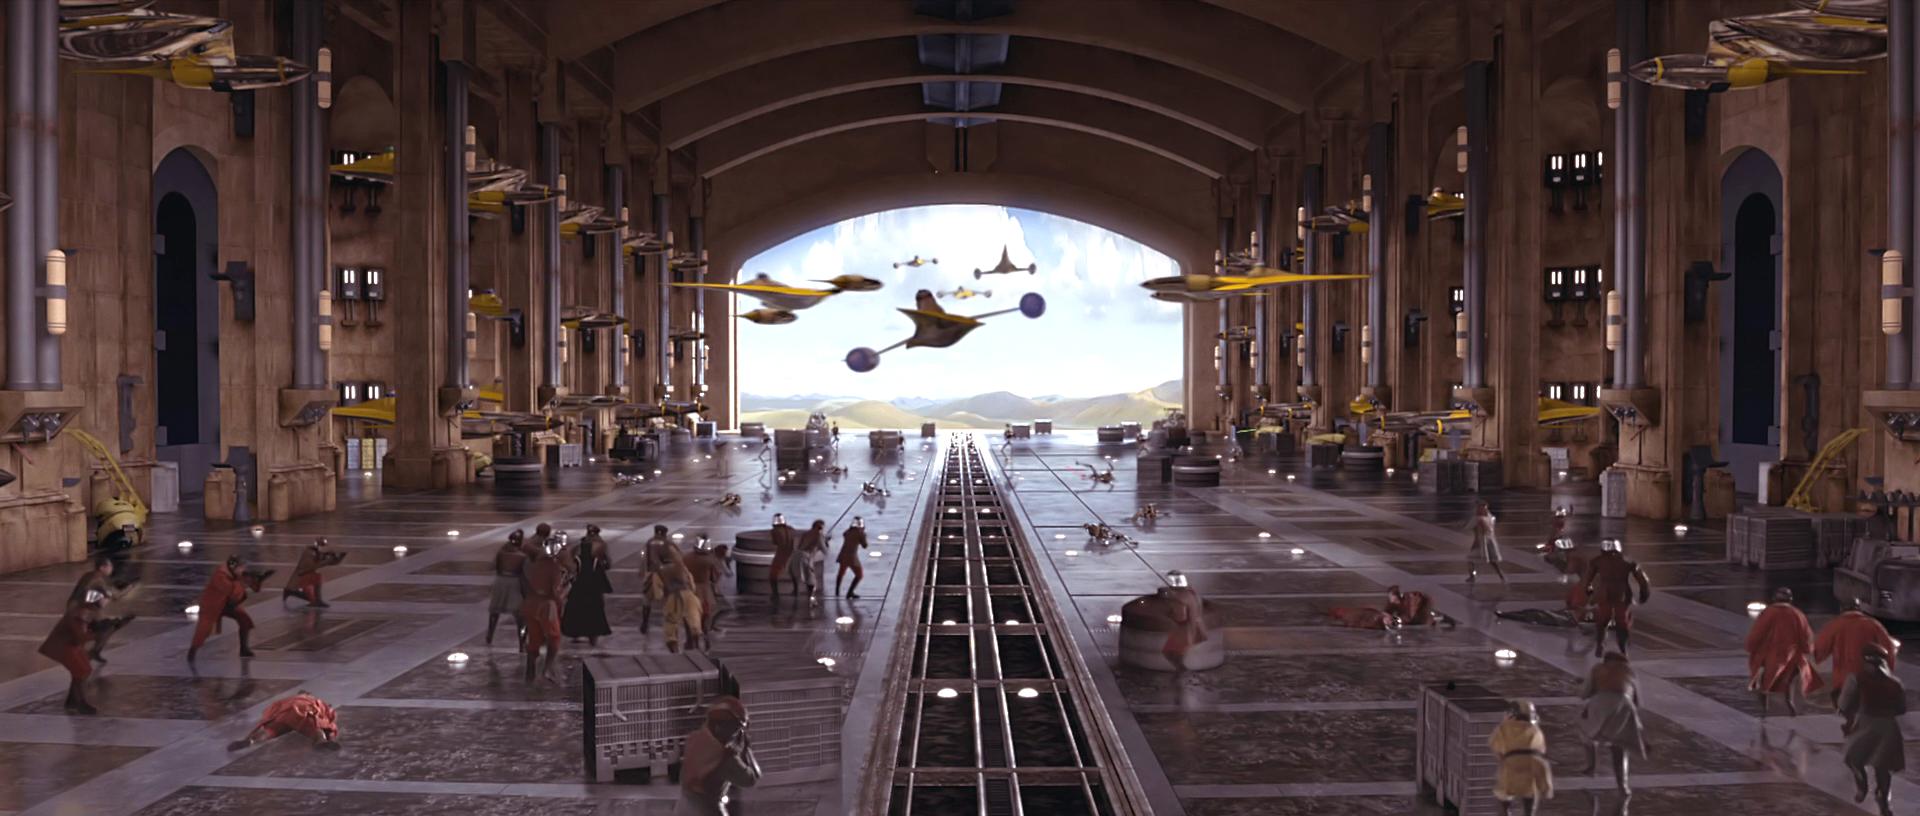 Theed Hangar | Wookieepedia | FANDOM powered by Wikia